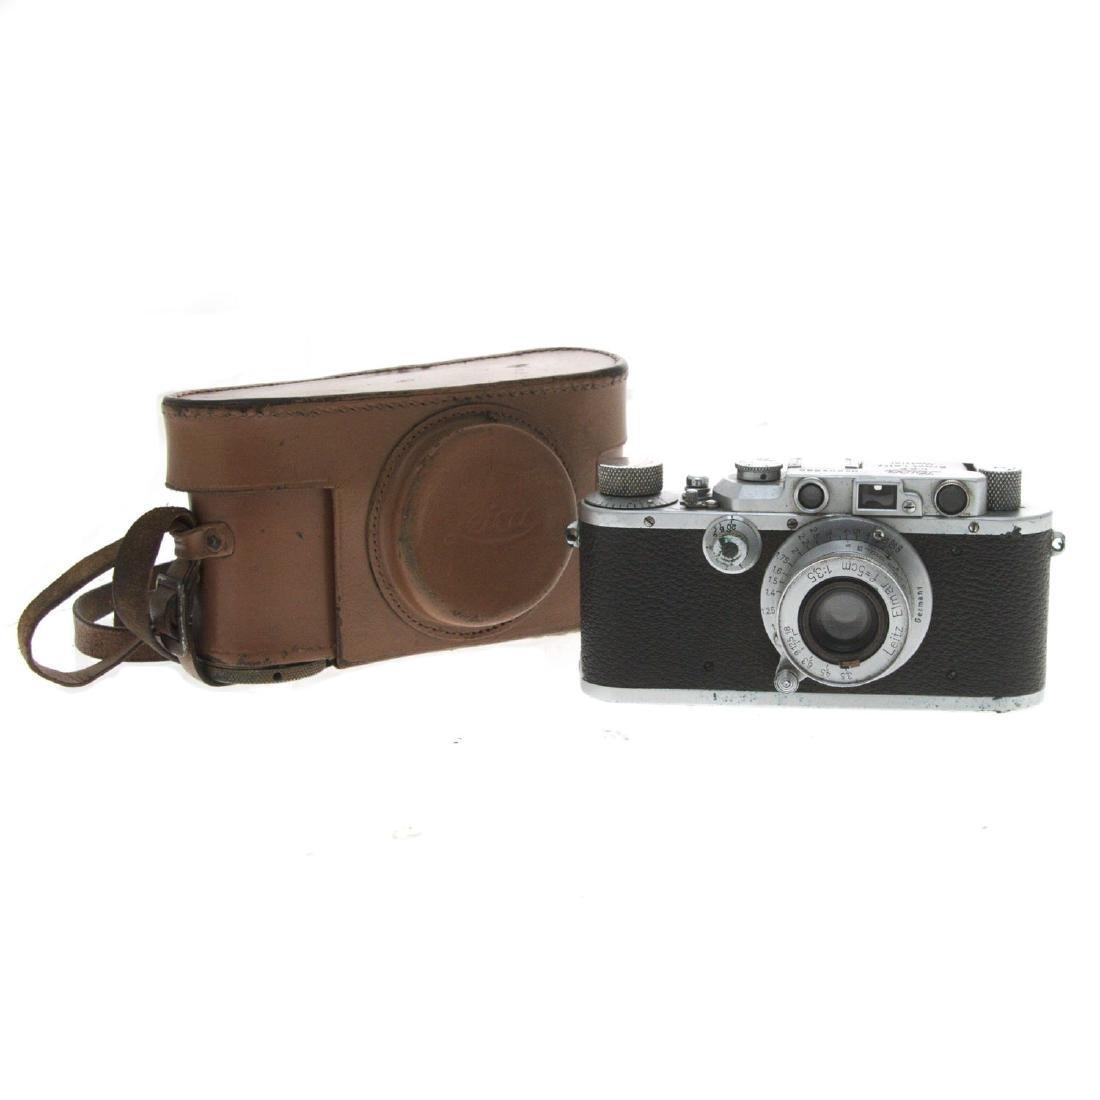 Leica II Ernst Leitz Wetzlar Camera with Elmar Lens.